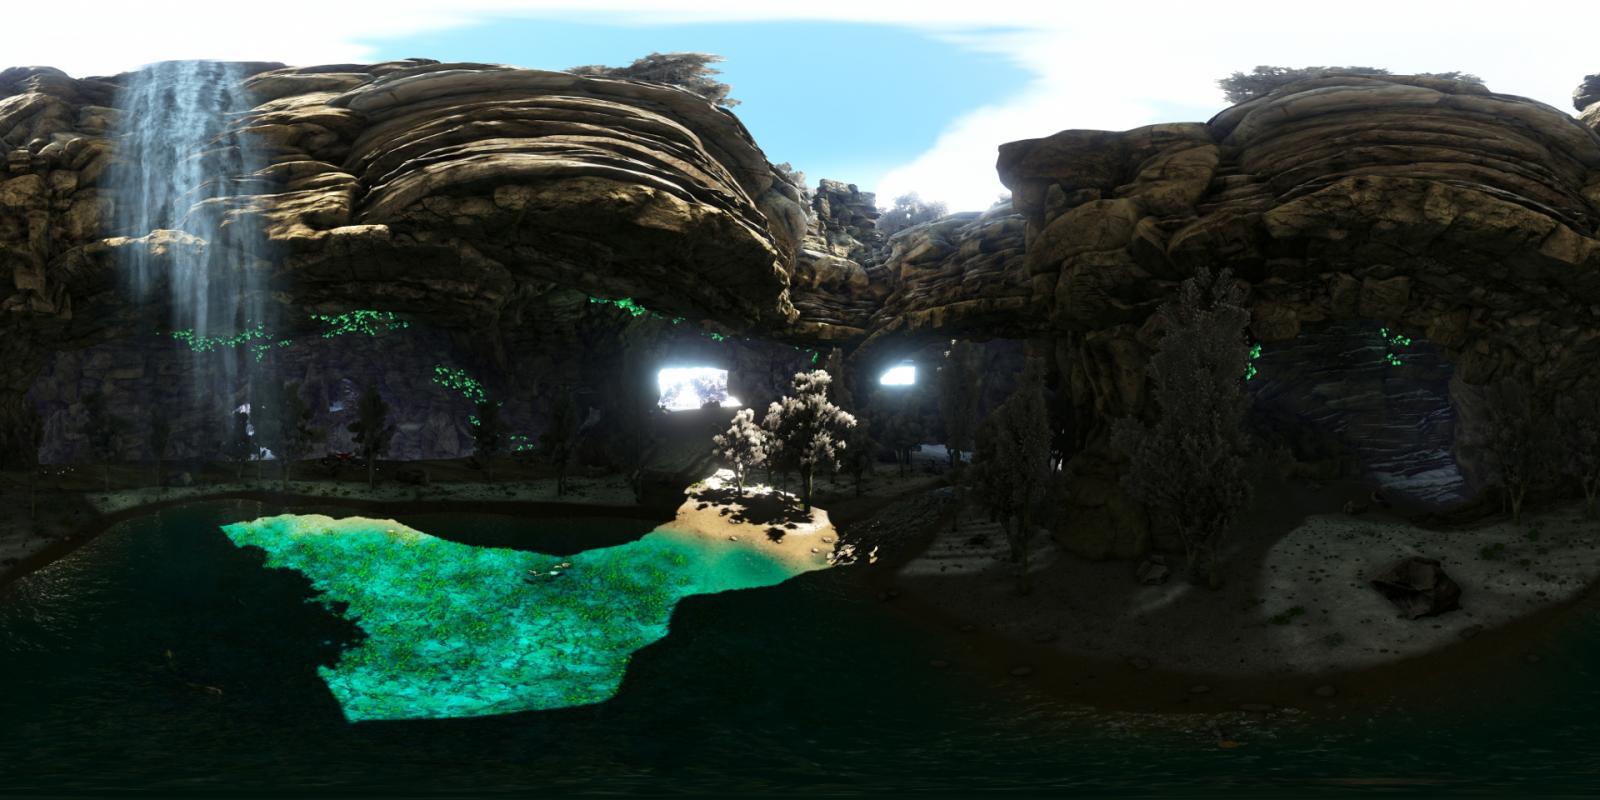 large.5882e6c47b947_FataL1ty-RockhillParadise-Panoramic360Stereoscopic3Dsta.jpg